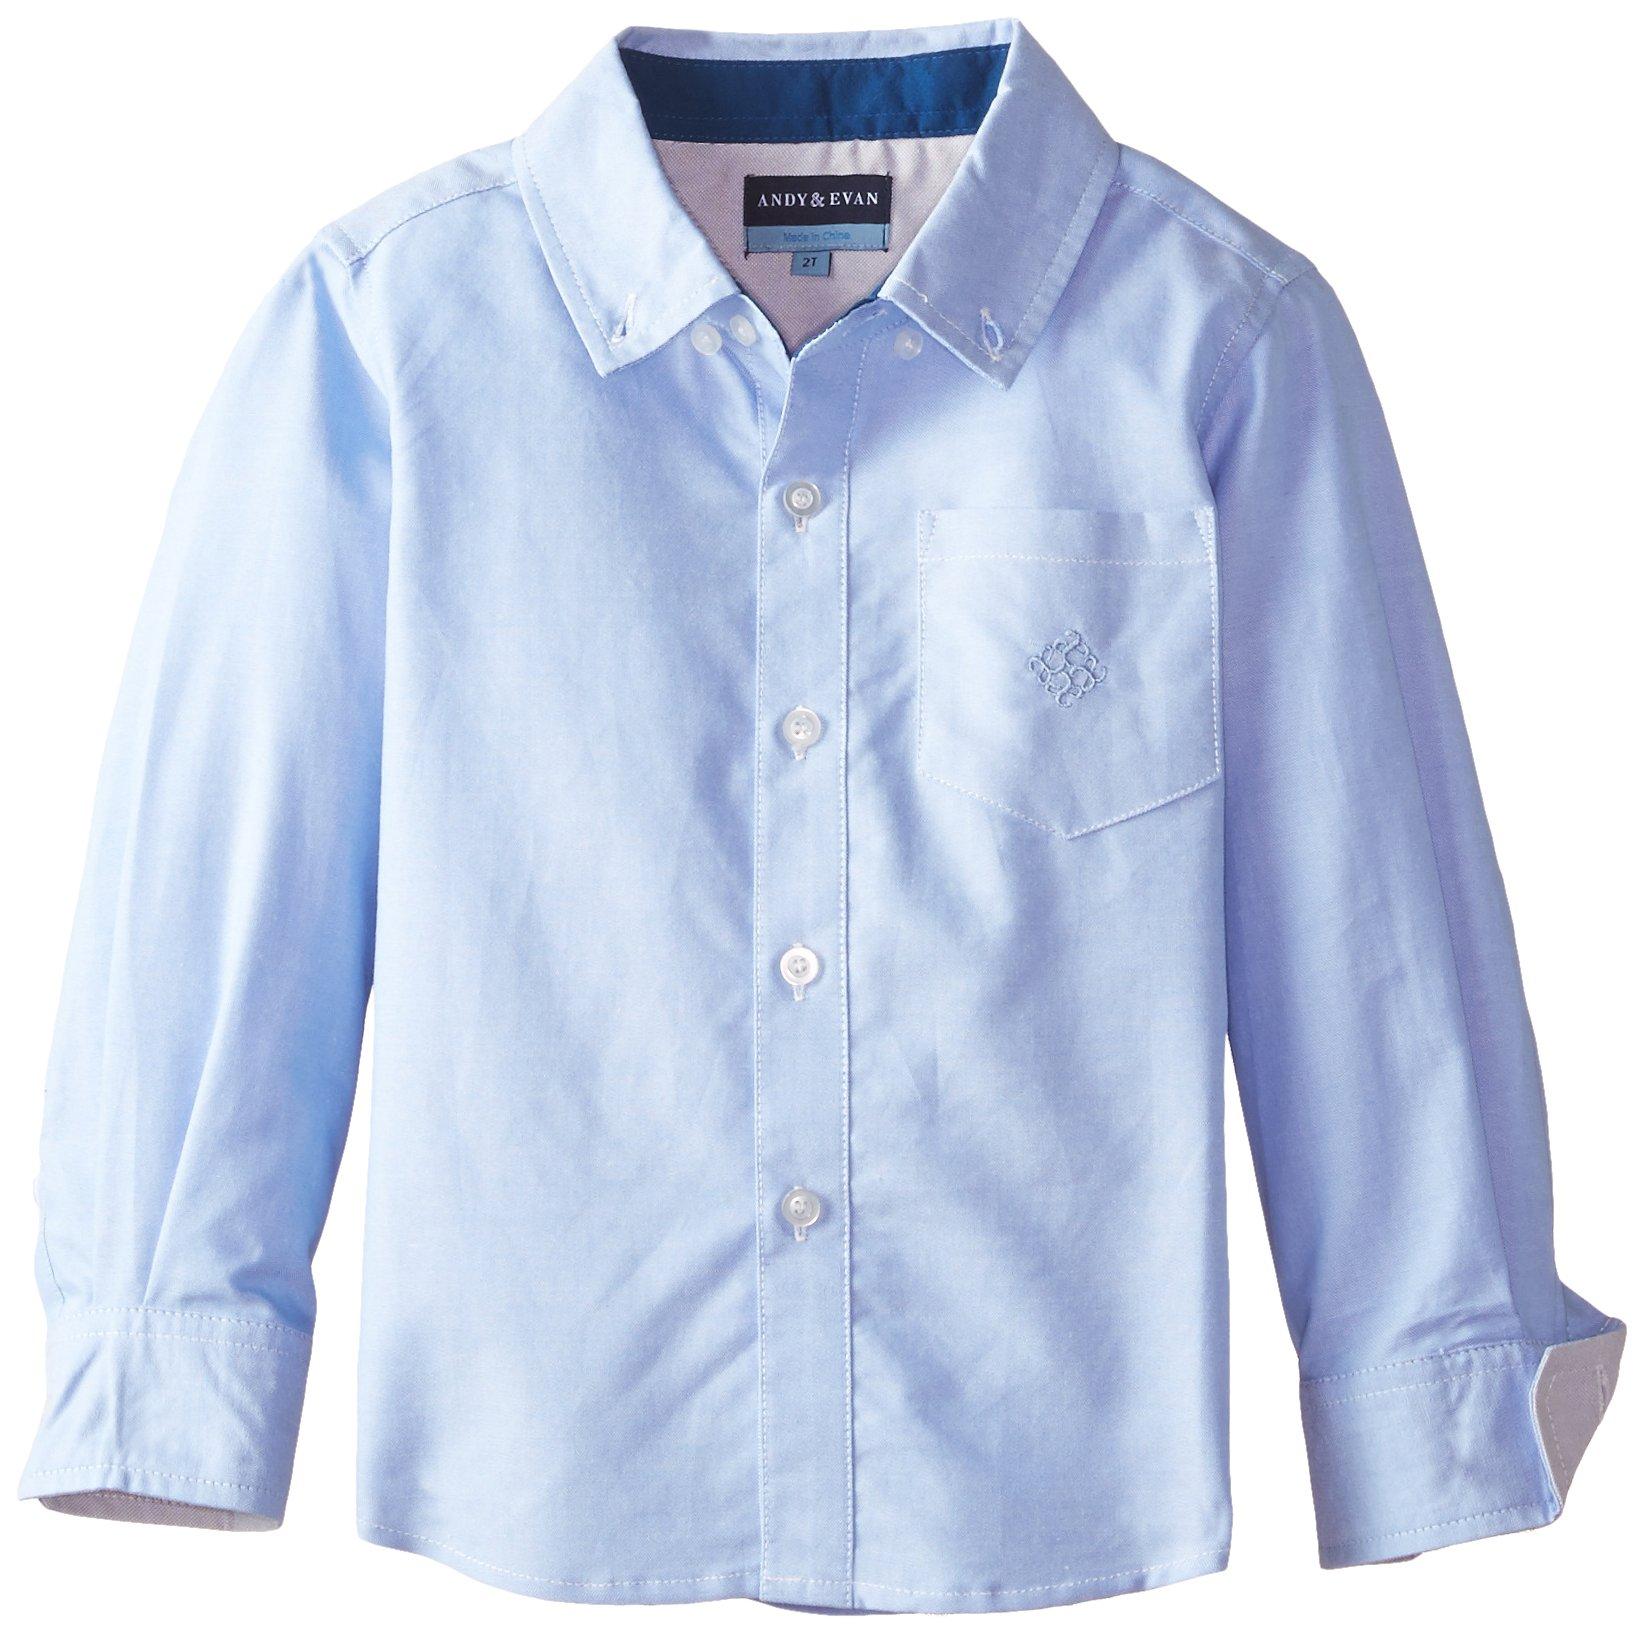 Andy & Evan Little Boys' Toddler Oxford Shirt, Light Blue, 3T